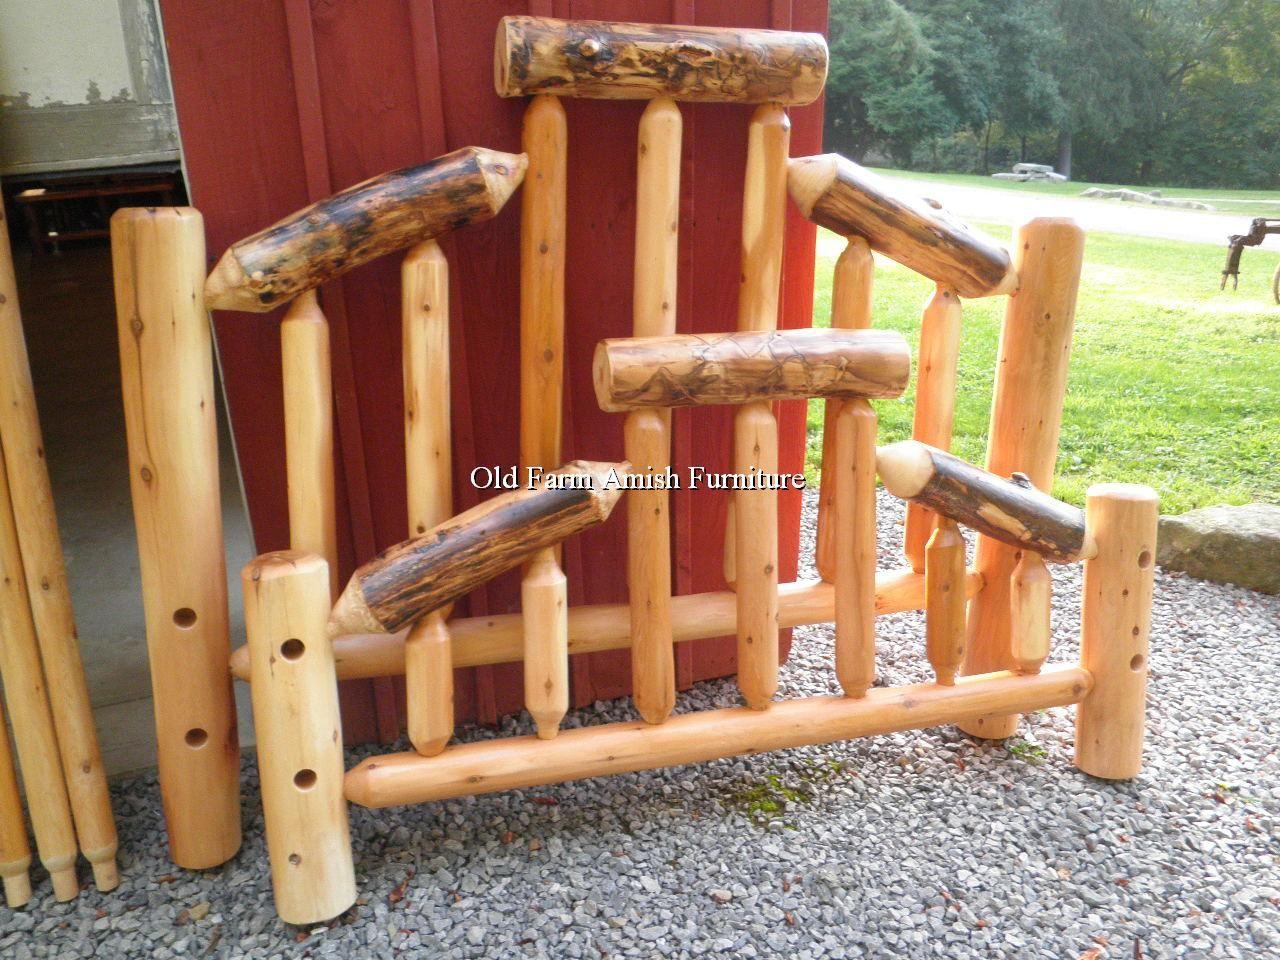 Cedar U0026 Aspen Log Rustic Beds Old Farm Amish Furniture   Dayton, PA (814